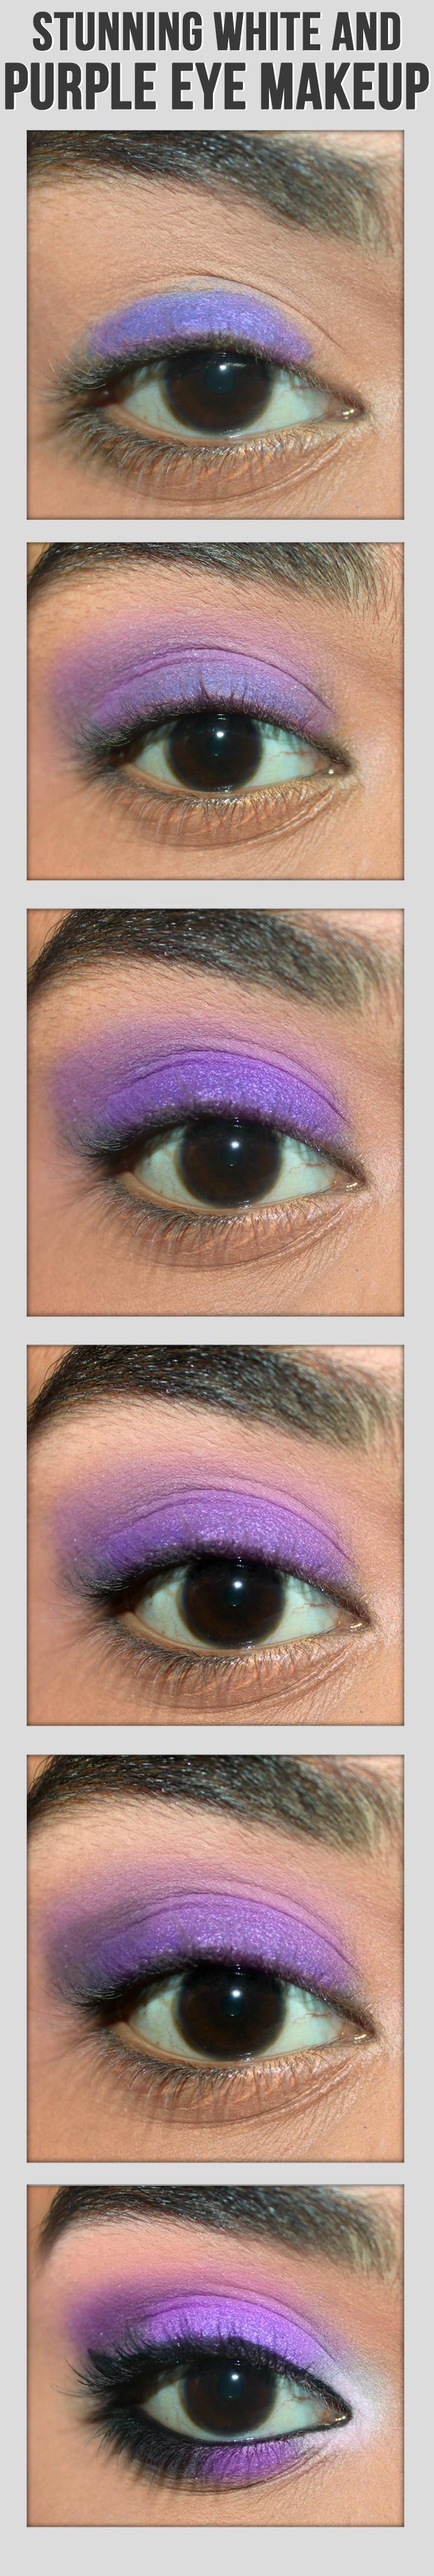 2 Simple Purple Eye Makeup Tutorials With Pictures Purple Eye